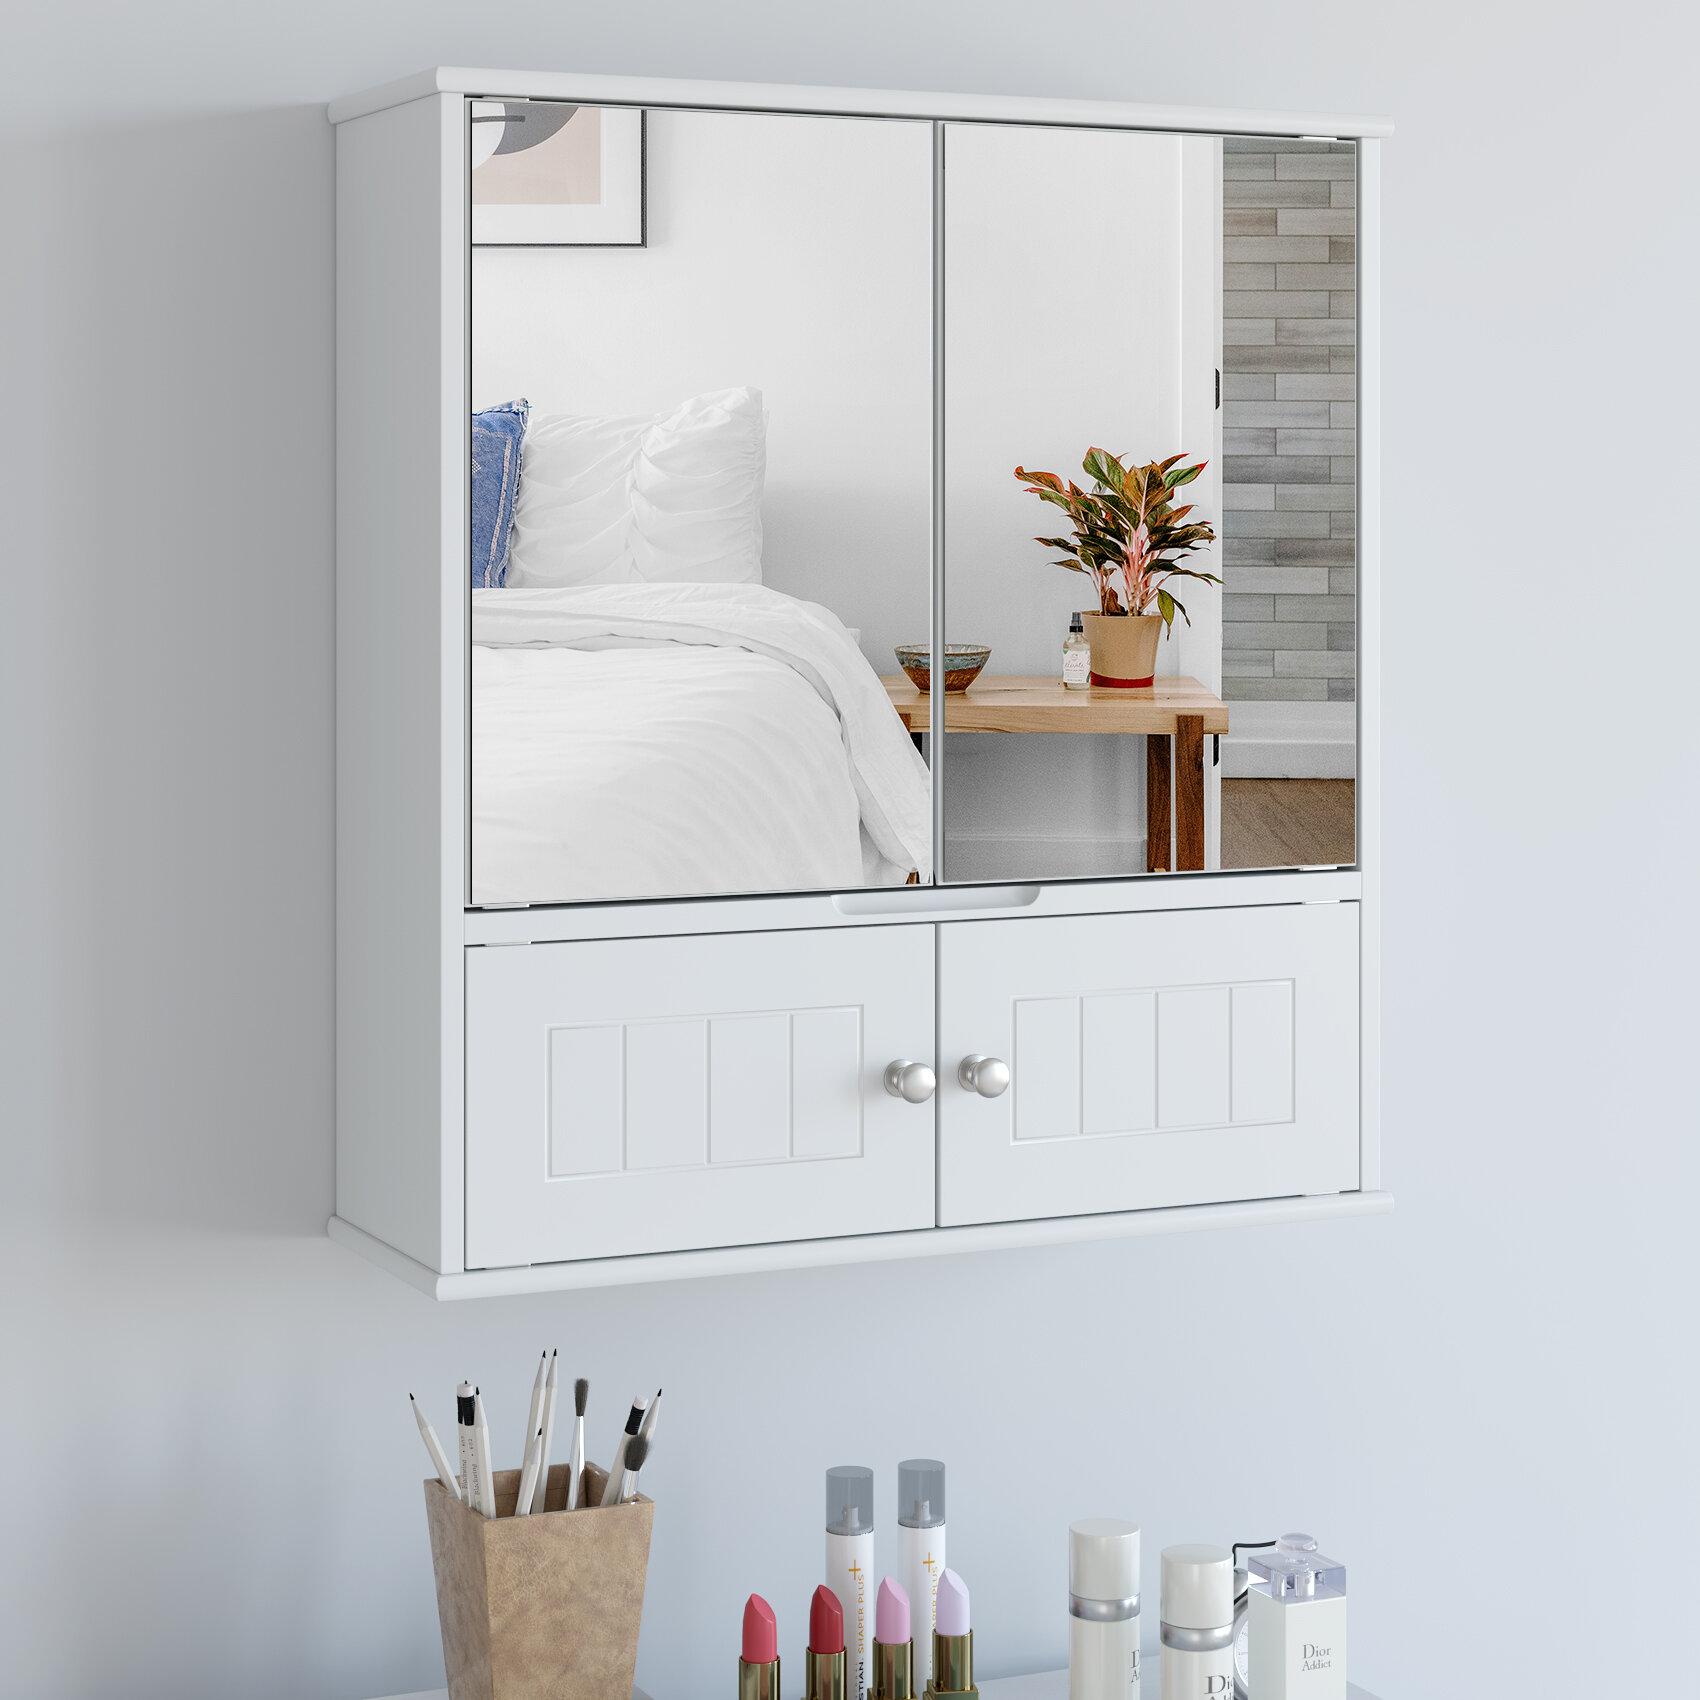 Red Barrel Studio Barzan Surface Mount Framed 2 Door Medicine Cabinet With 3 Adjustable Shelves Reviews Wayfair